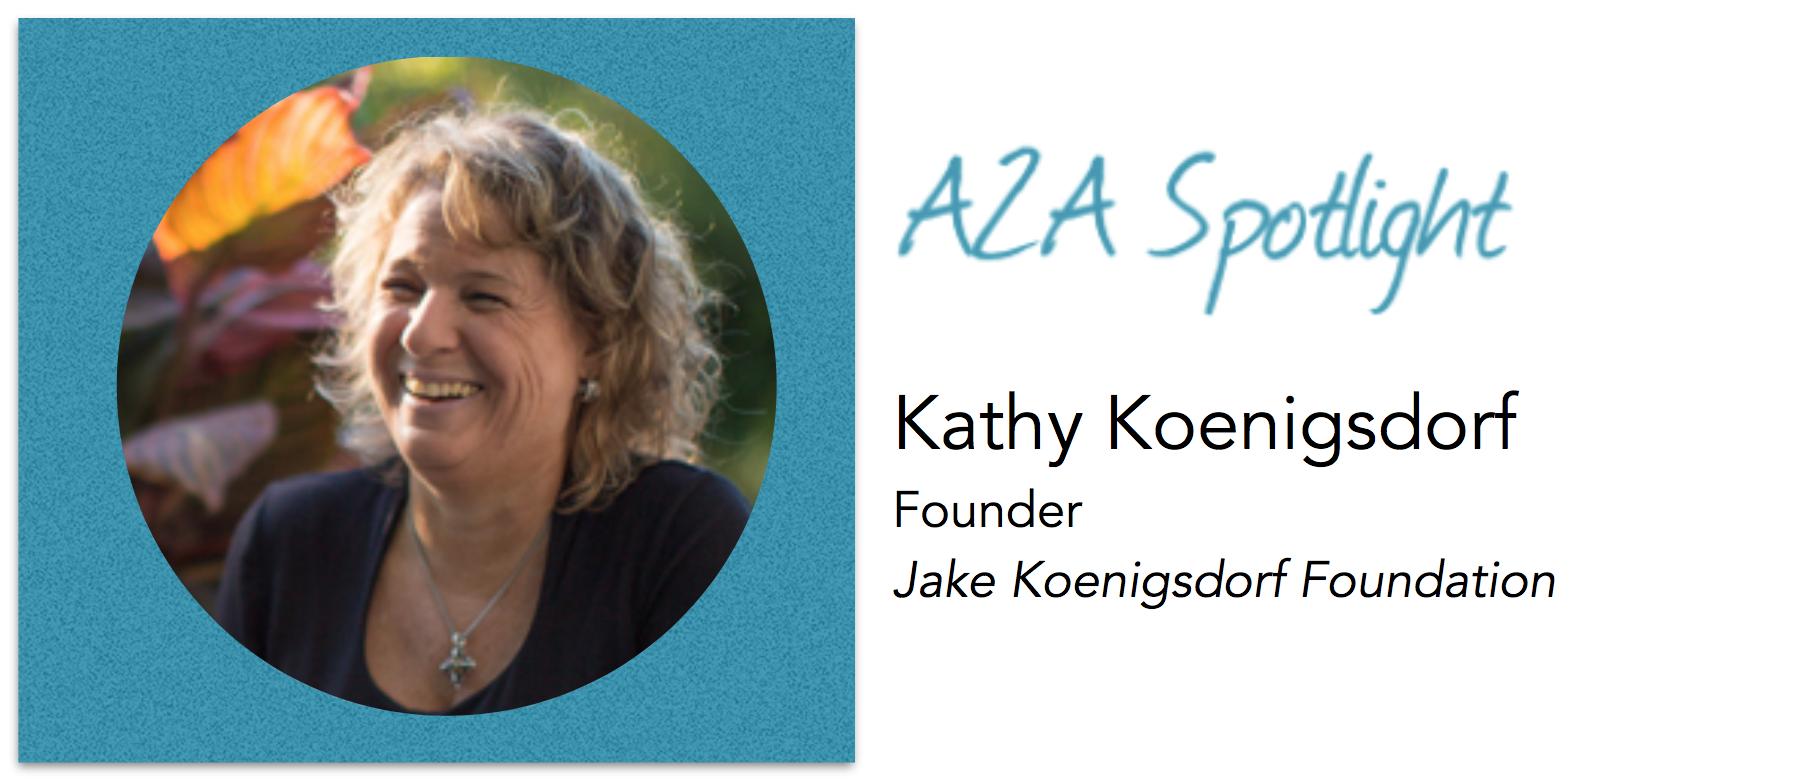 Kathy Koenigsdorf